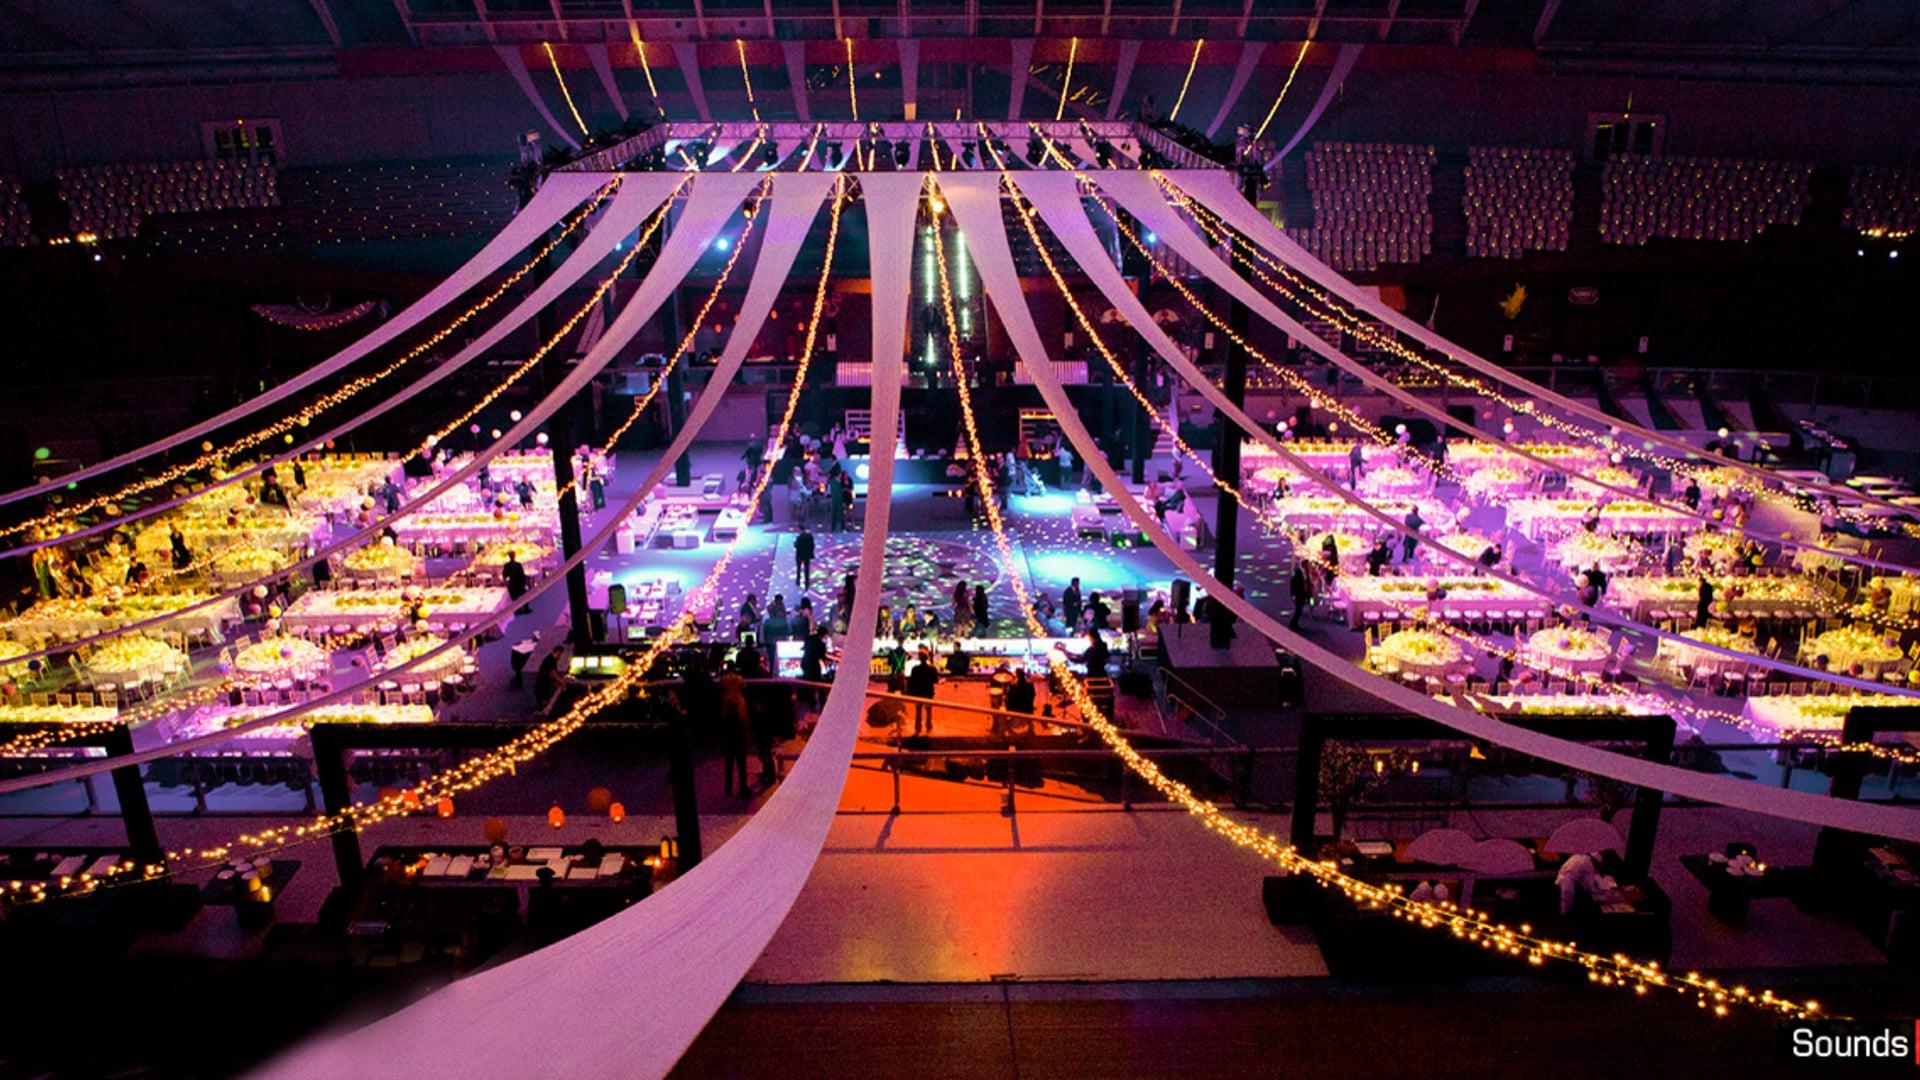 Winter wedding party @ O.A.C.A Velodrome